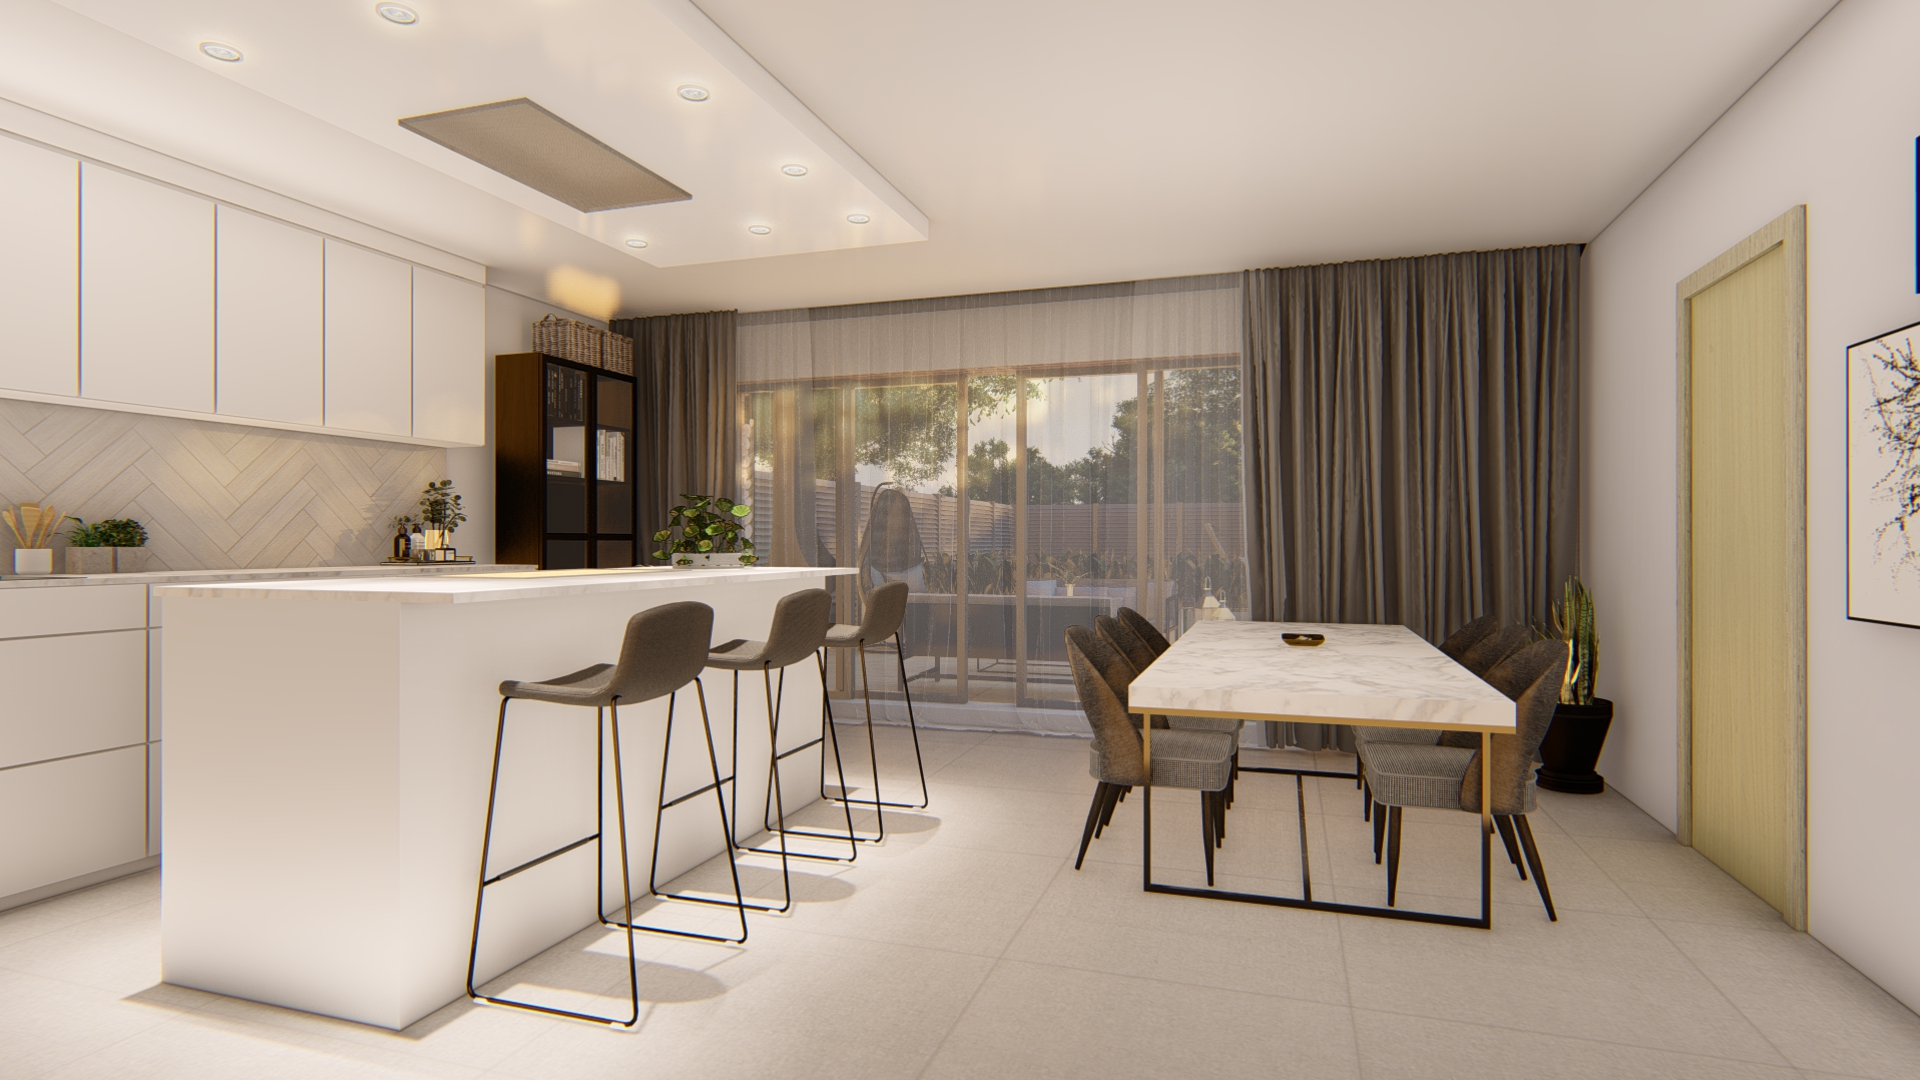 Carter-Zub - Residential development